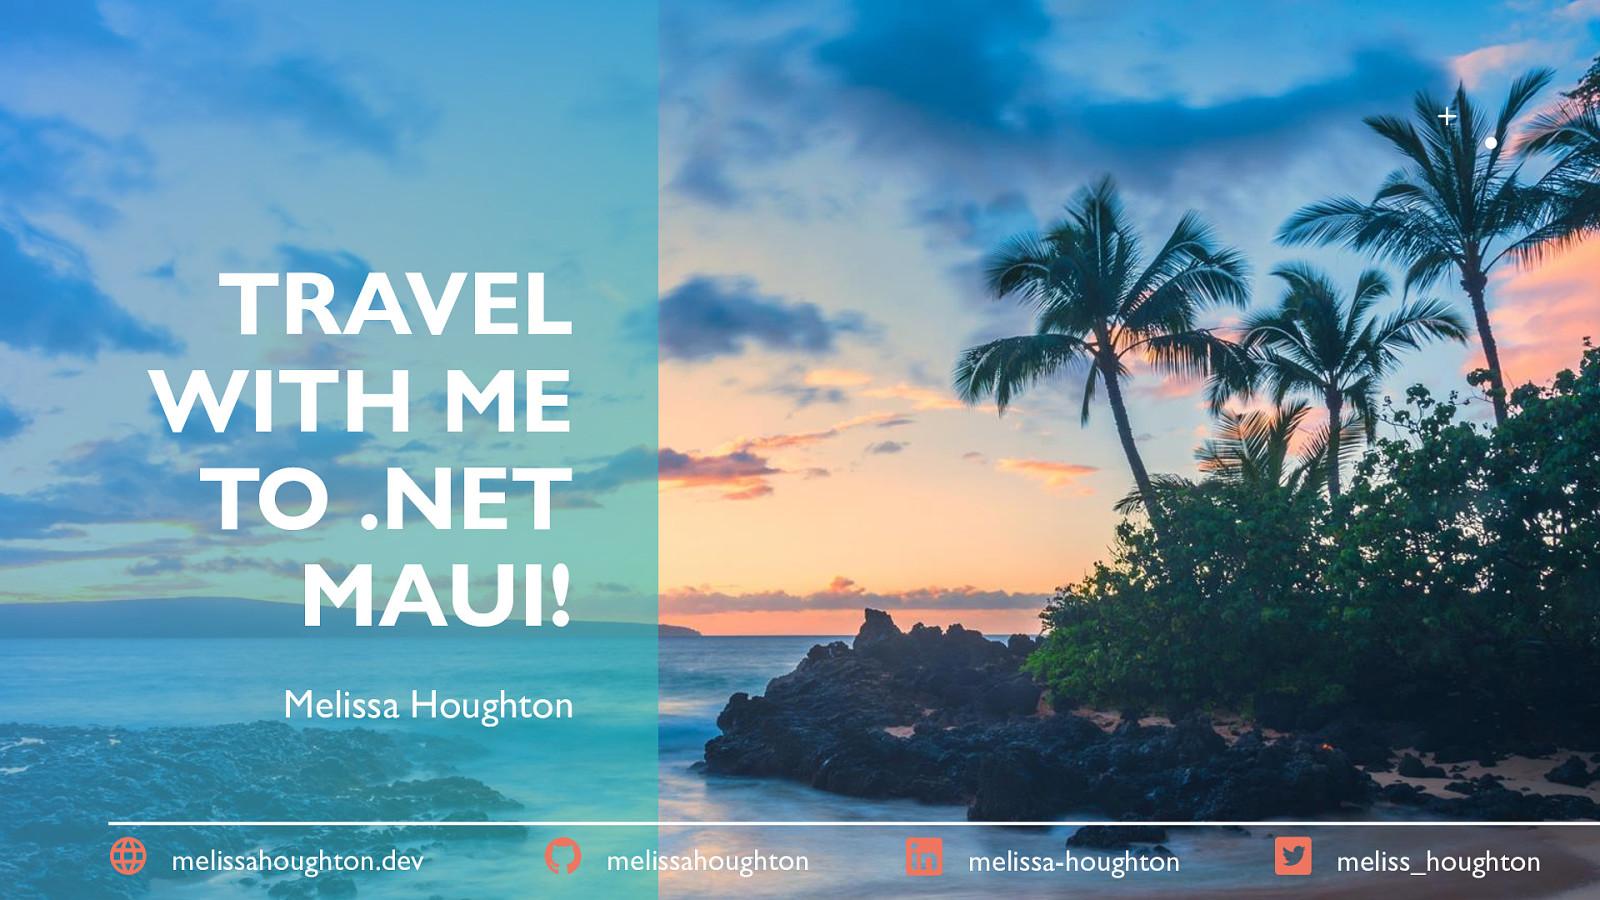 Travel with me to (.NET) MAUI!